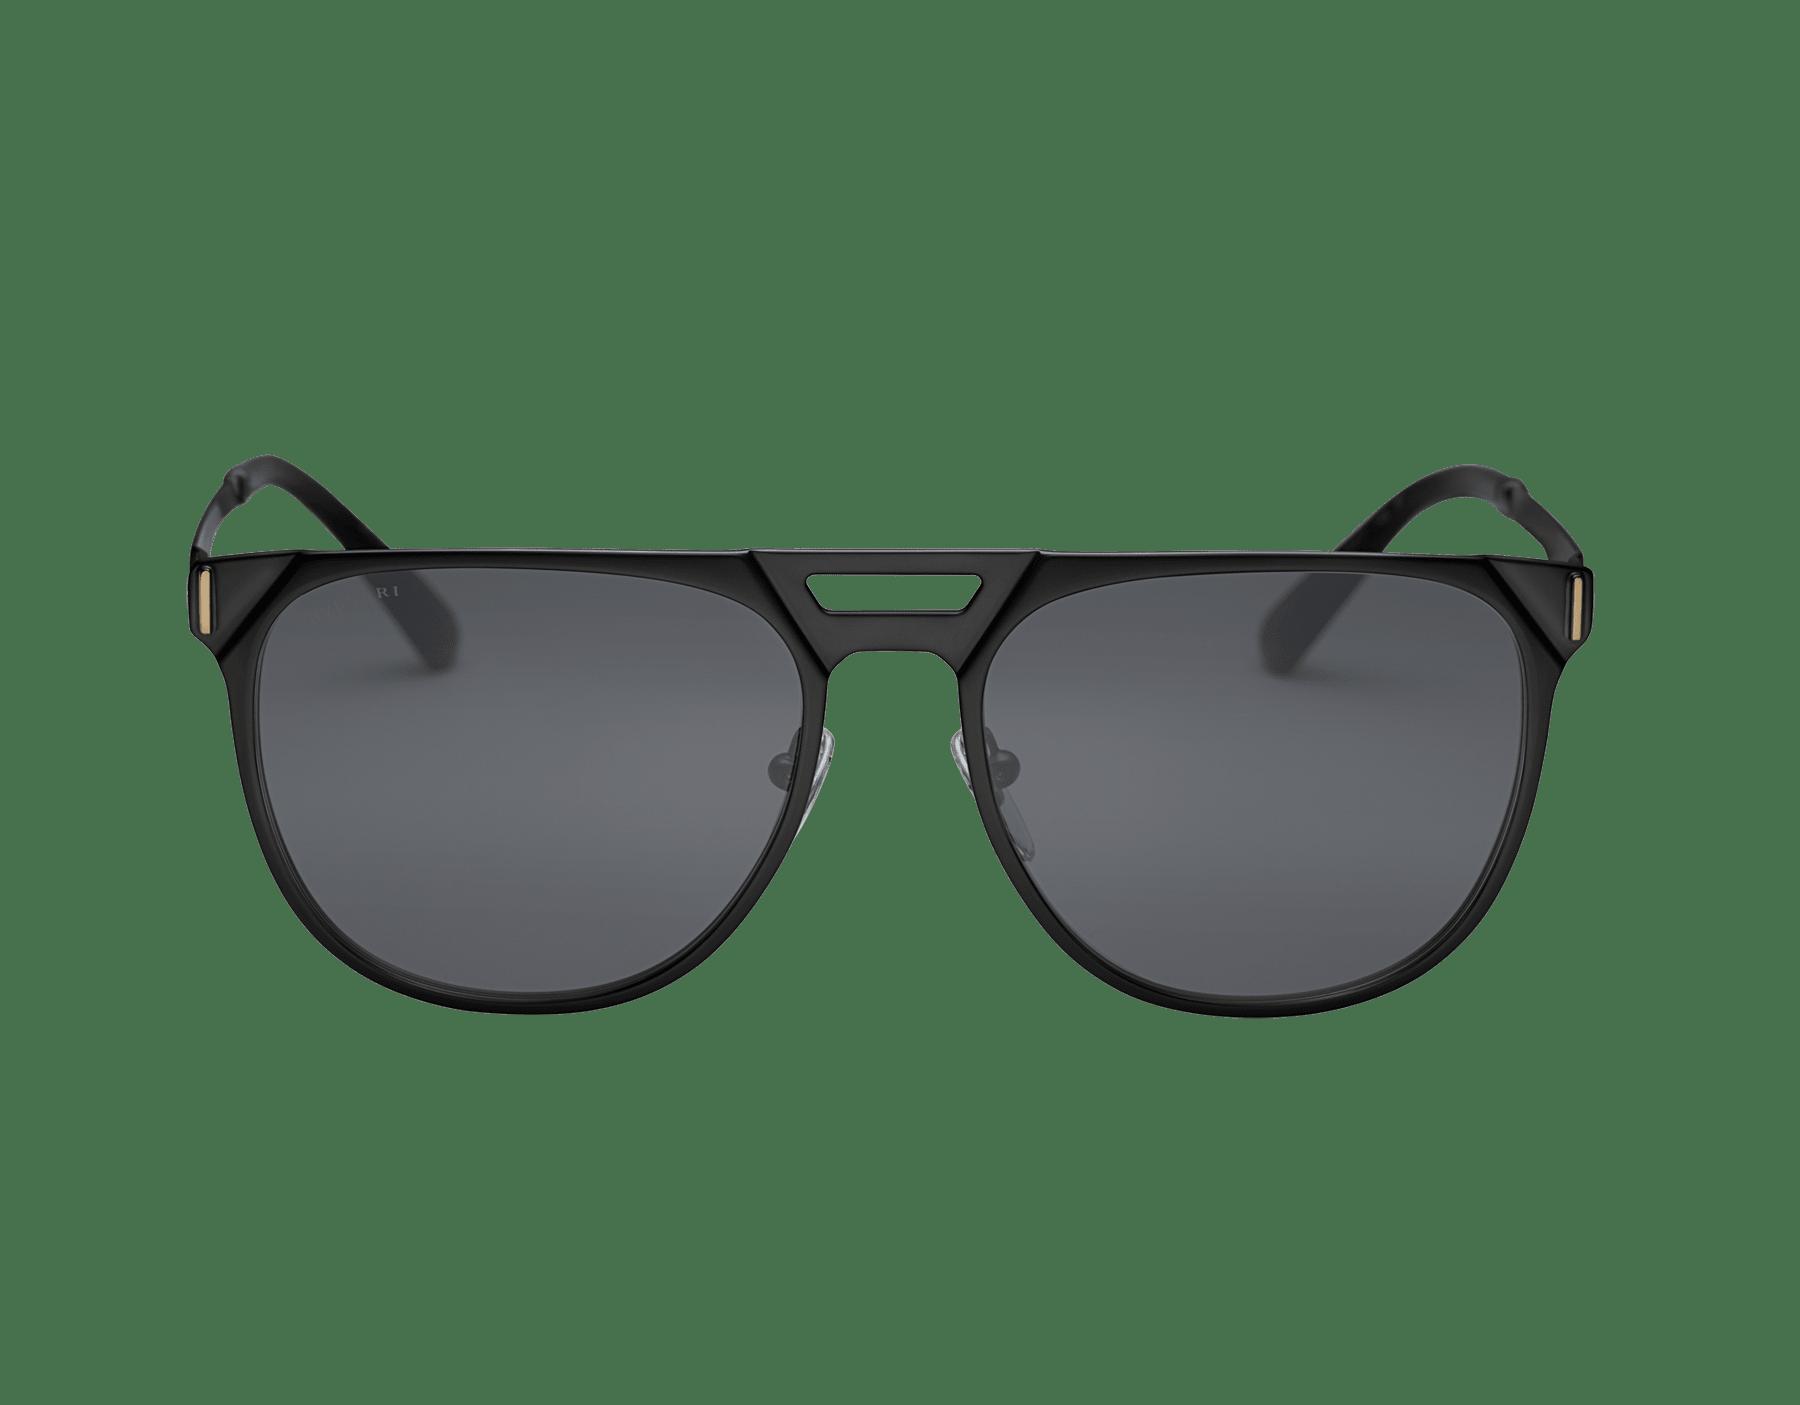 Bulgari Octo squared pilot gold plated metal sunglasses with polar lenses 903689 image 2